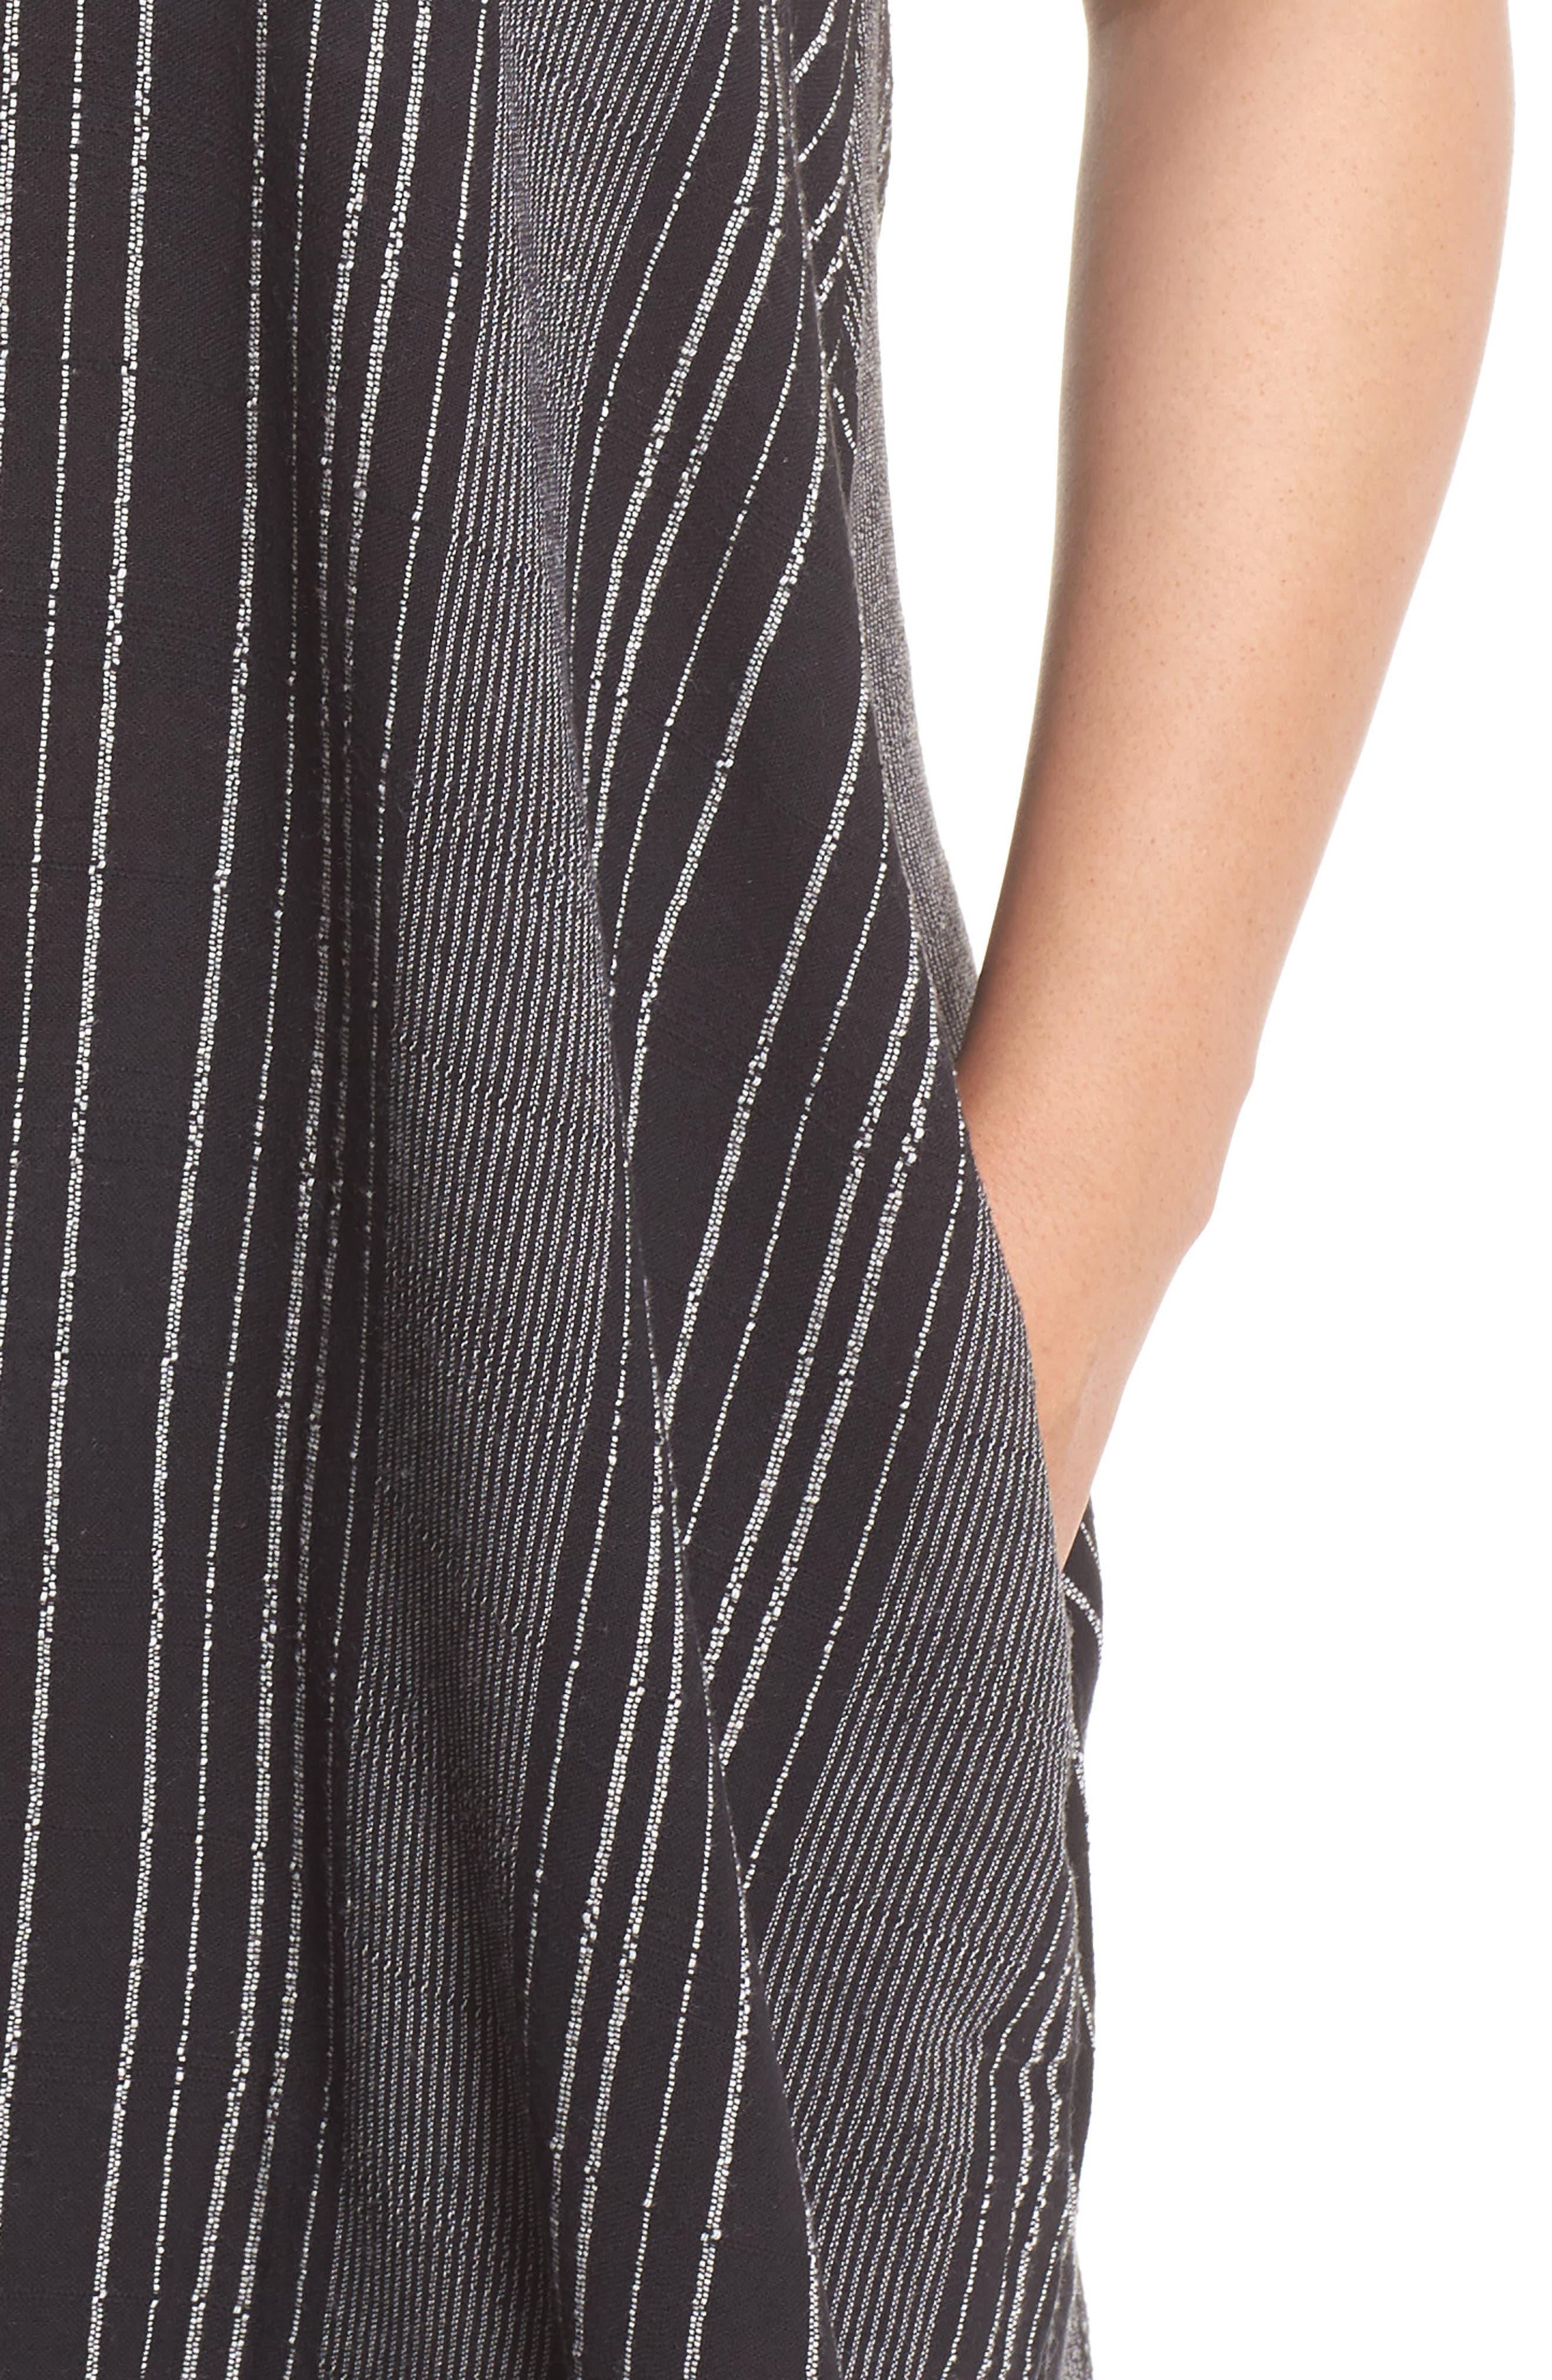 Cover-Up Maxi Dress,                             Alternate thumbnail 4, color,                             BLACK/ WHITE STRIPE